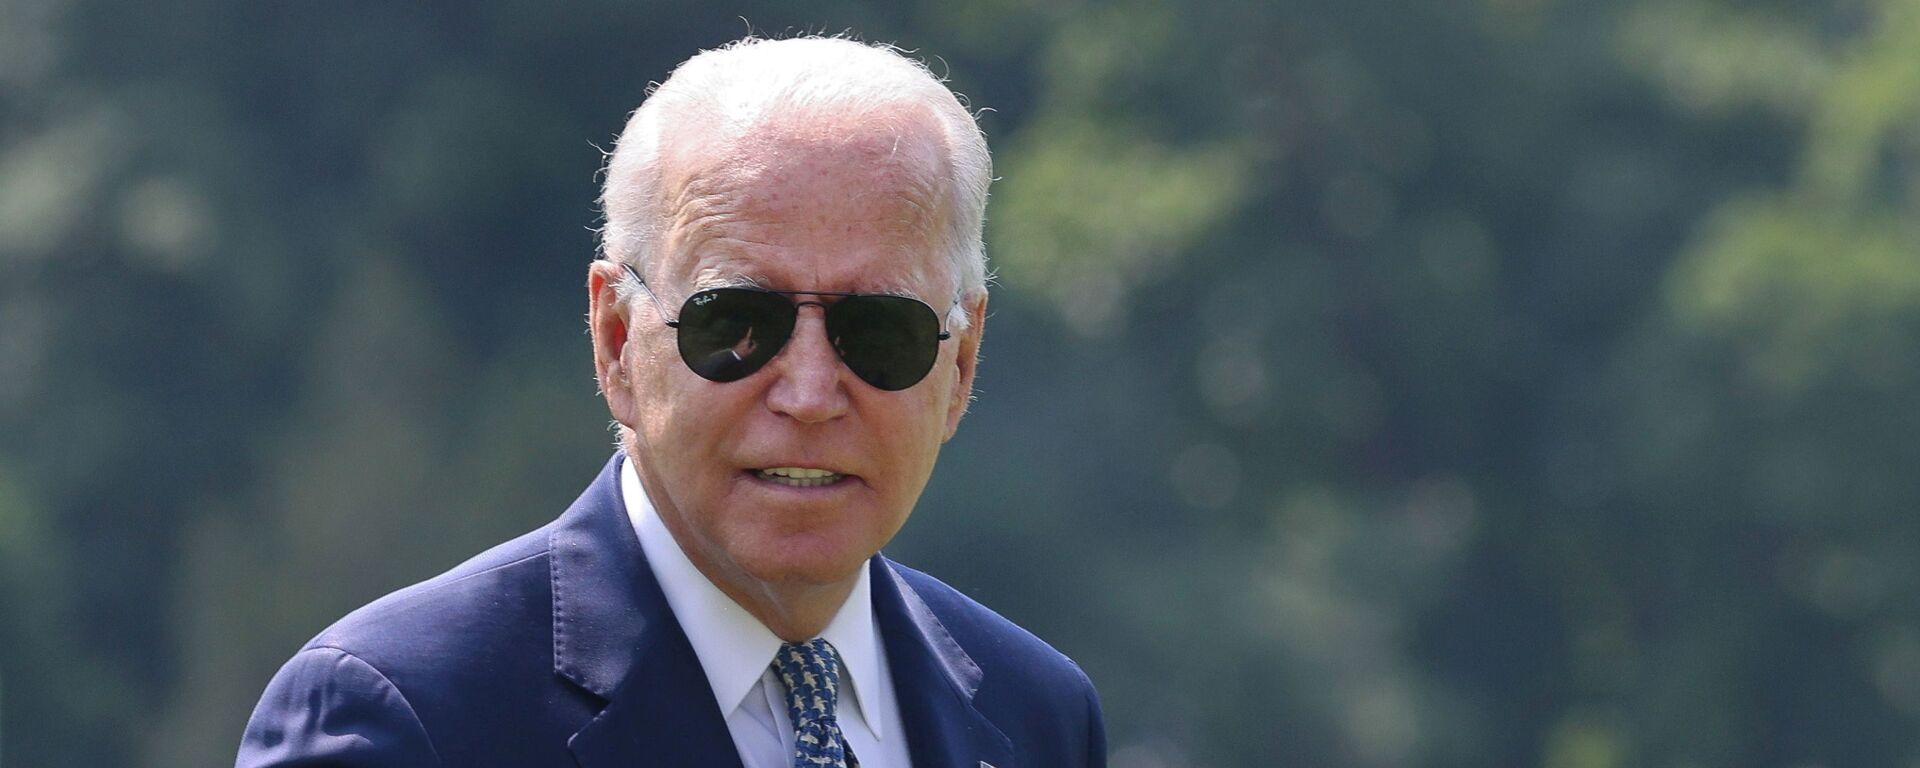 U.S. President Joe Biden gestures towards members of the media as he arrives at the White House following a stay in Delaware, in Washington, U.S., August 10, 2021. - Sputnik 日本, 1920, 23.08.2021